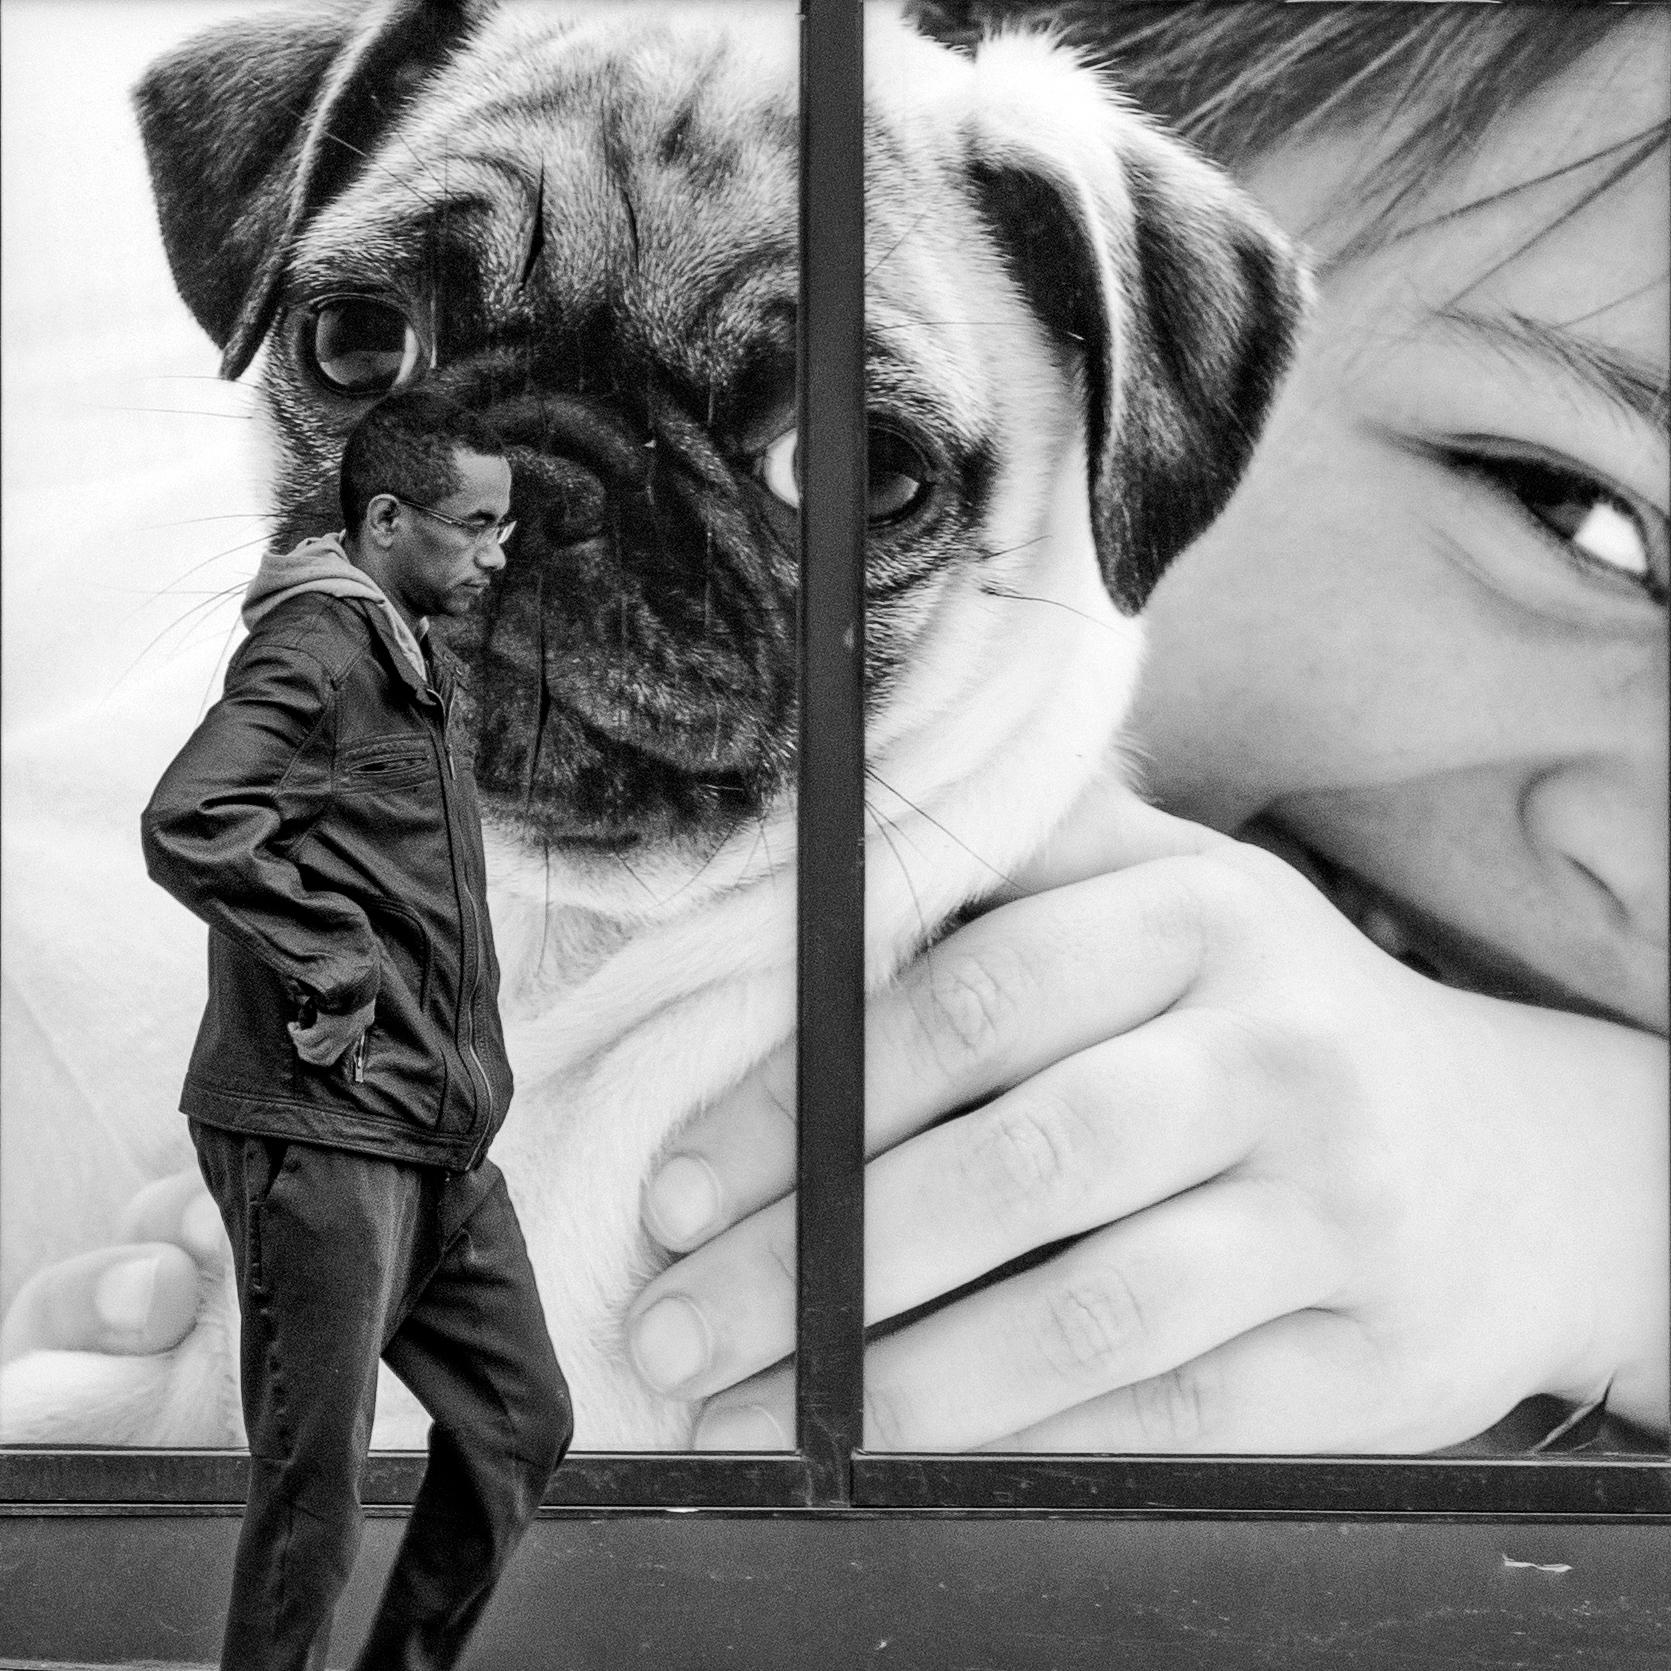 Pug Life - streetphotography, street - jeff_day   ello